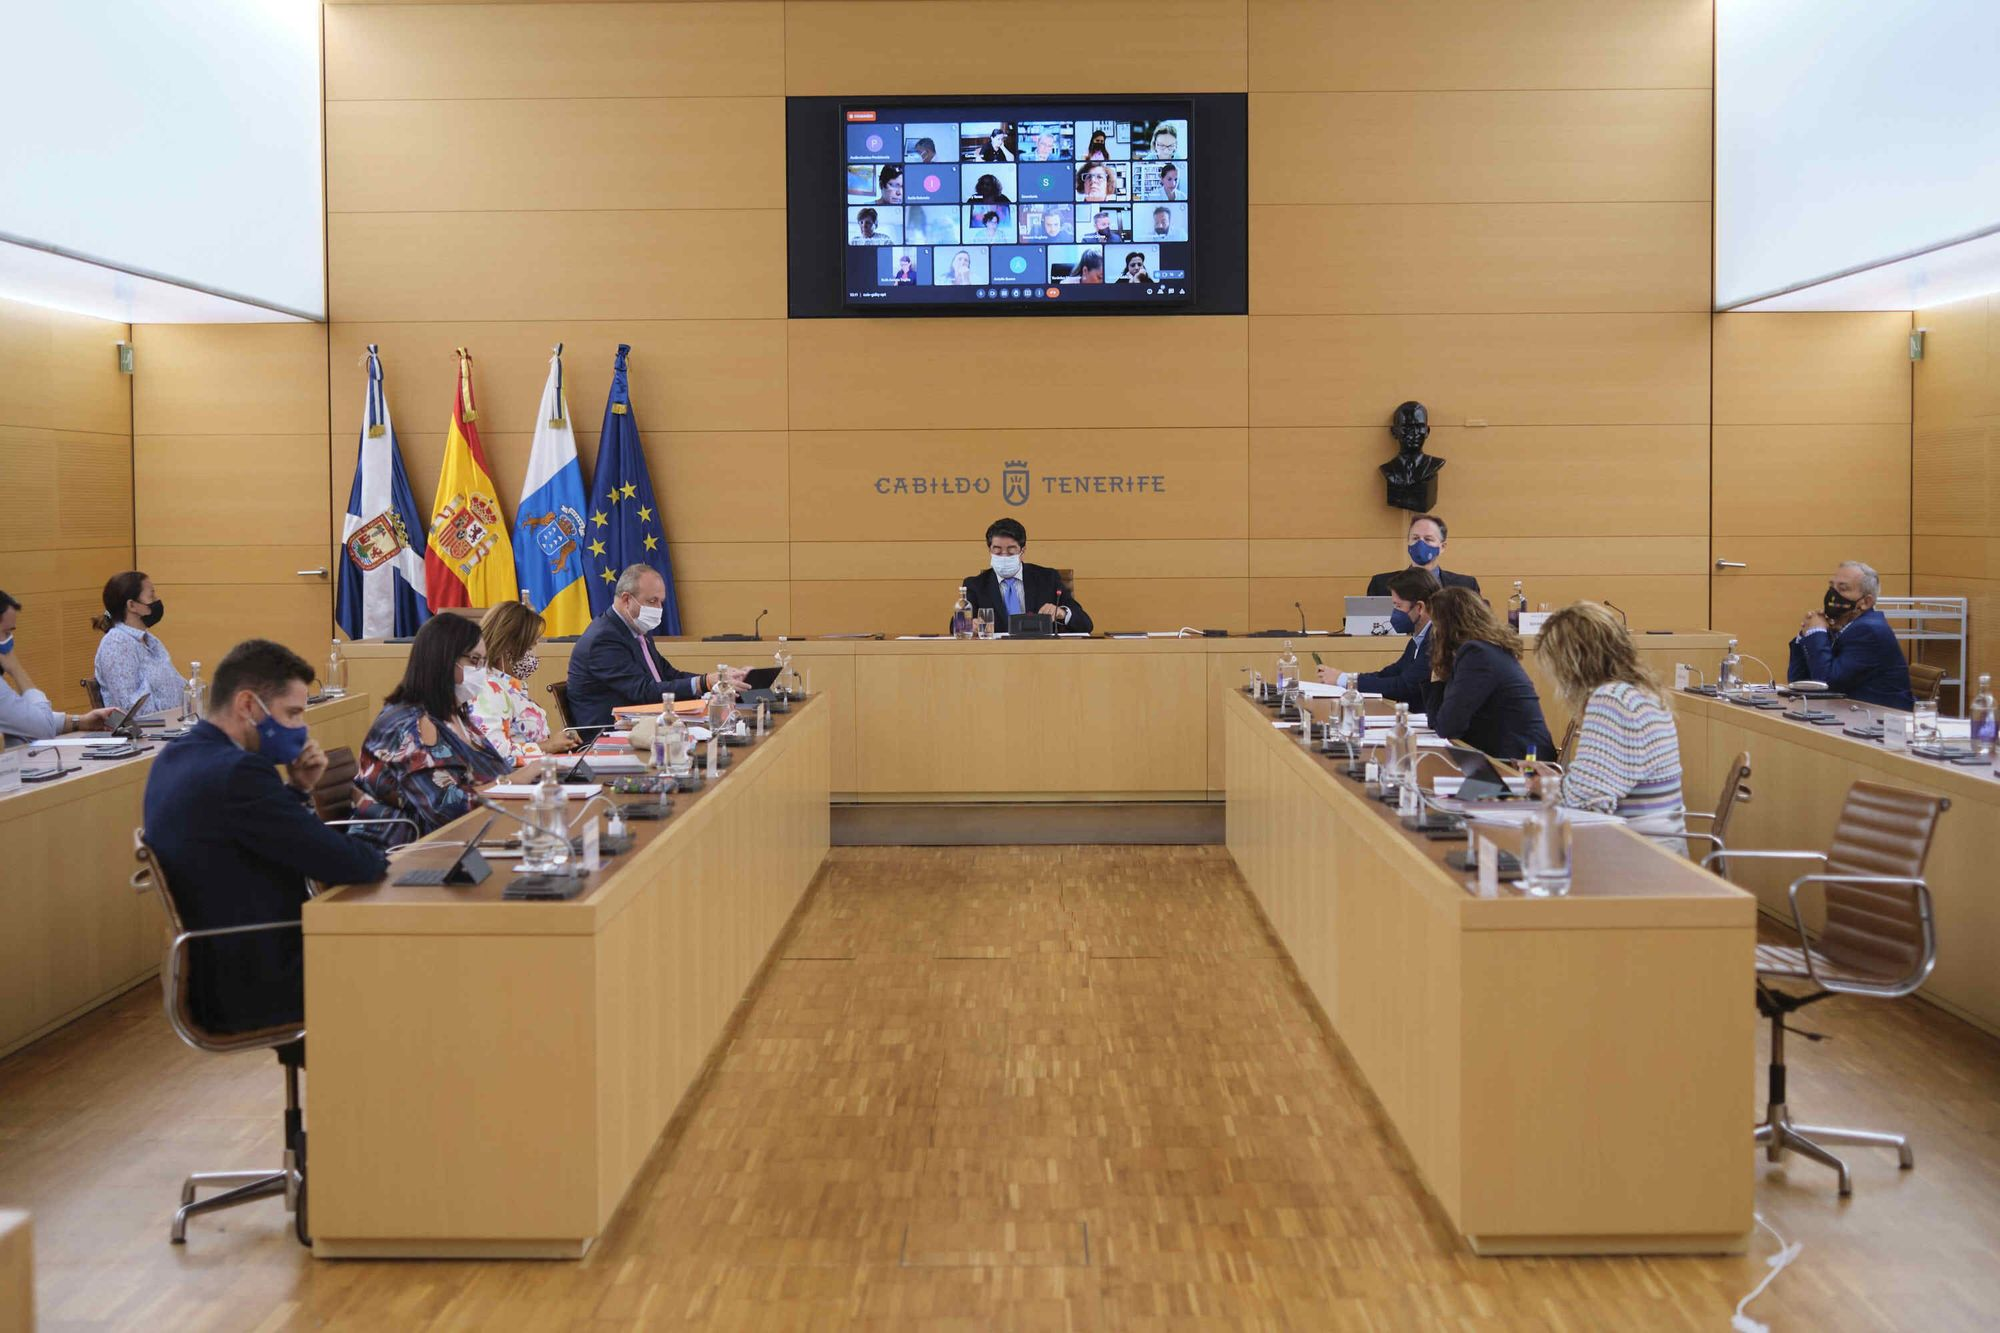 Pleno del Cabildo de Tenerife, 20/09/2021